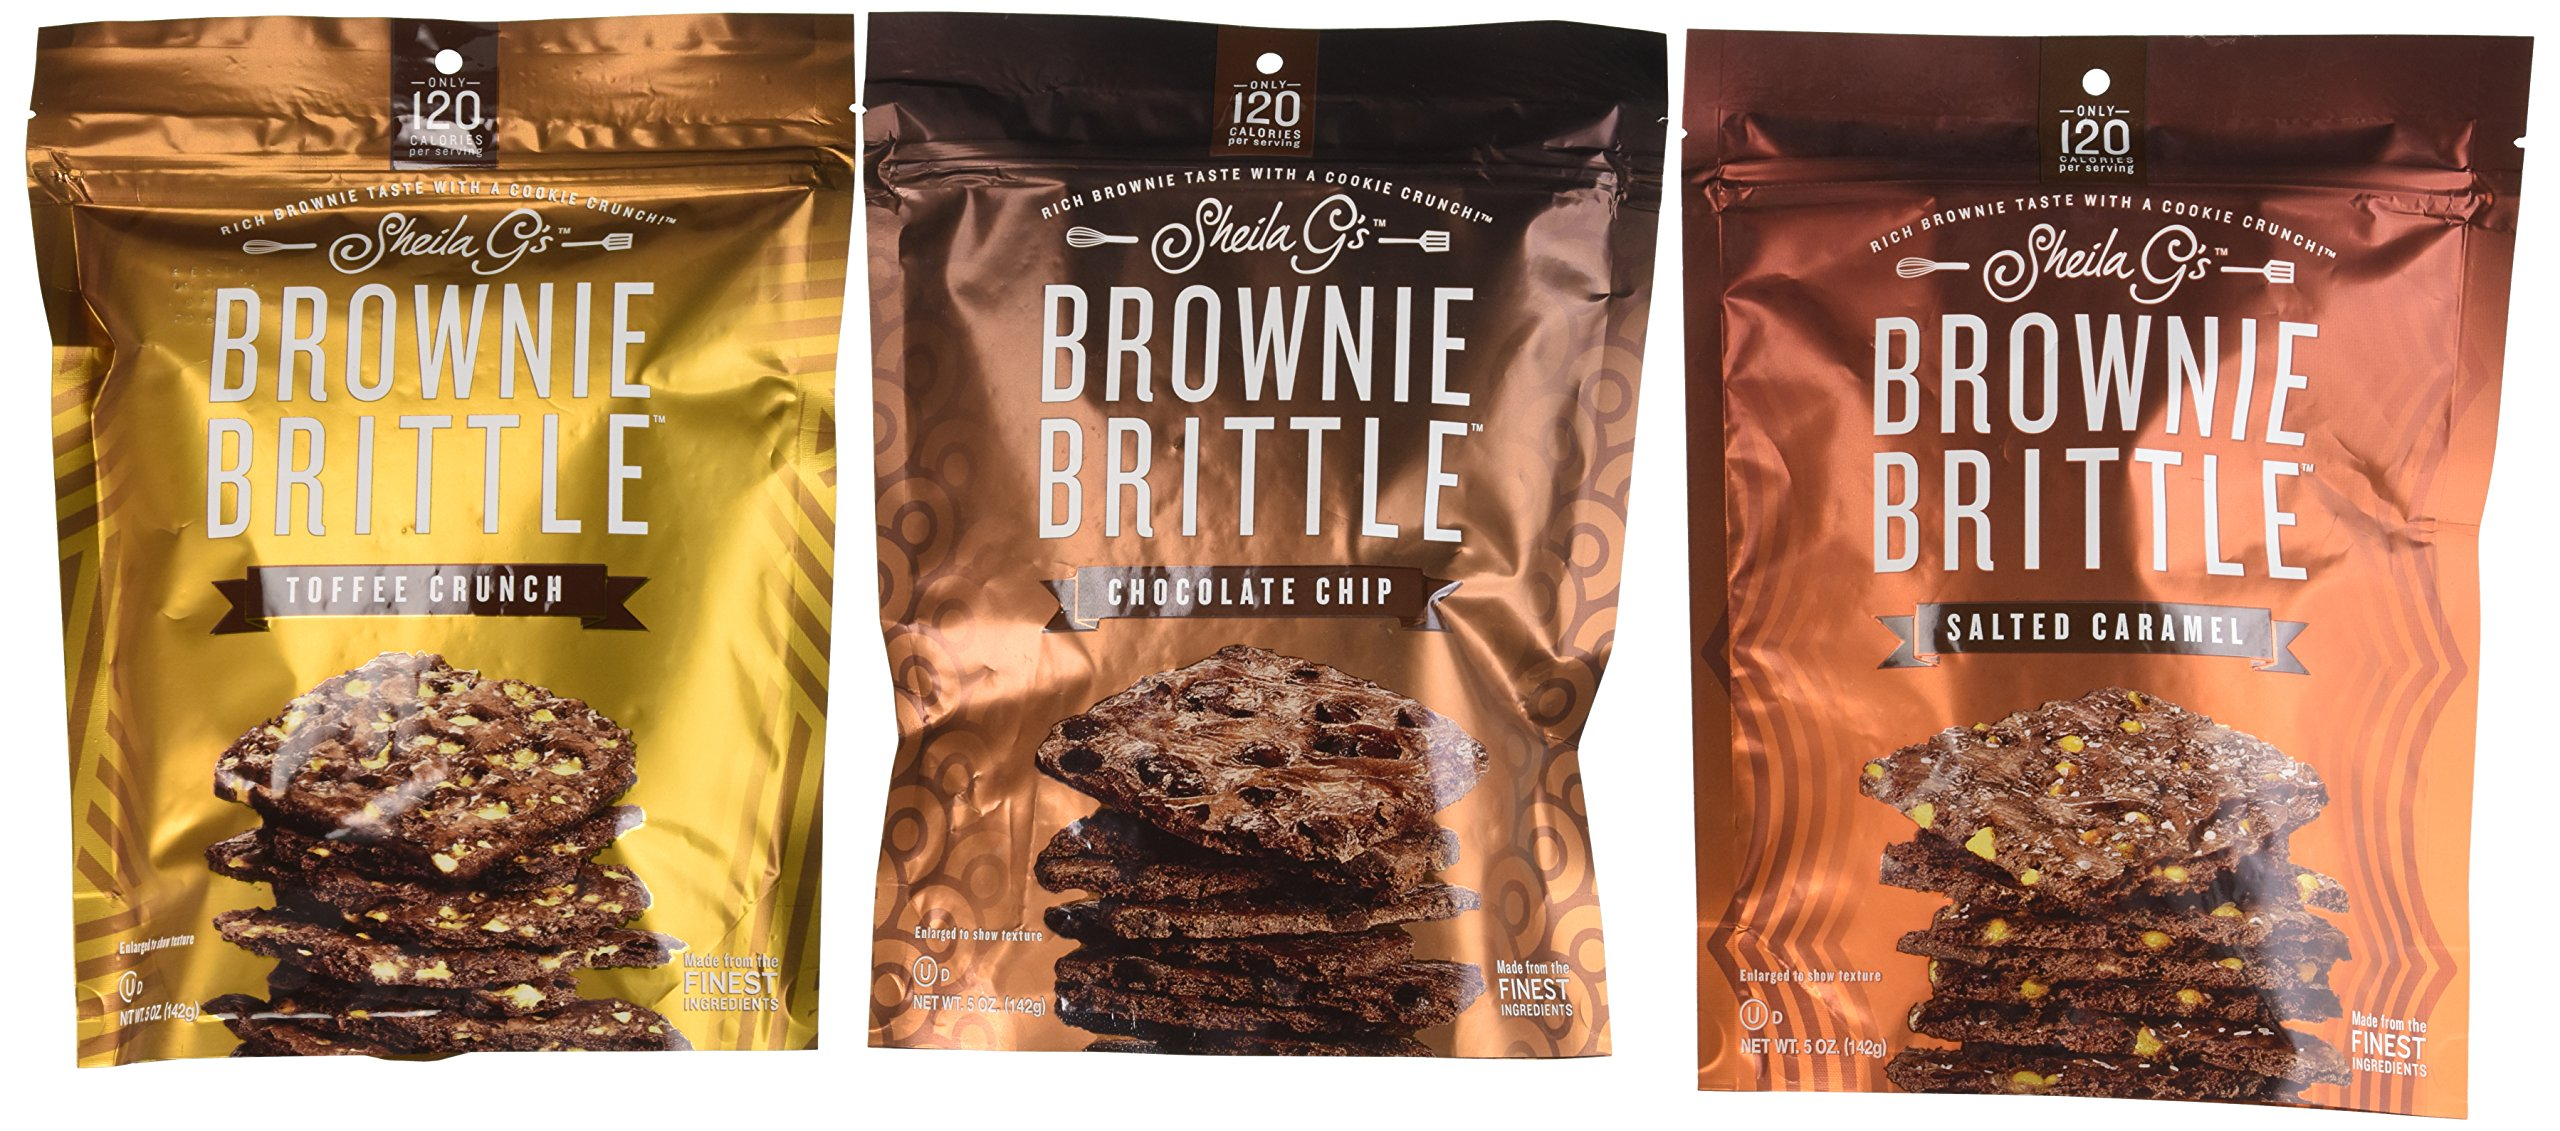 Sheila G's Brownie Brittle 3 Flavor Variety Bundle: (1) Sheila G's Salted Caramel Brownie Brittle, (1) Sheila G's Chocolate Chip Brownie Brittle, and (1) Sheila G's Toffee Crunch Brownie Brittle, 5 Oz. Ea. (3 Bags Total)